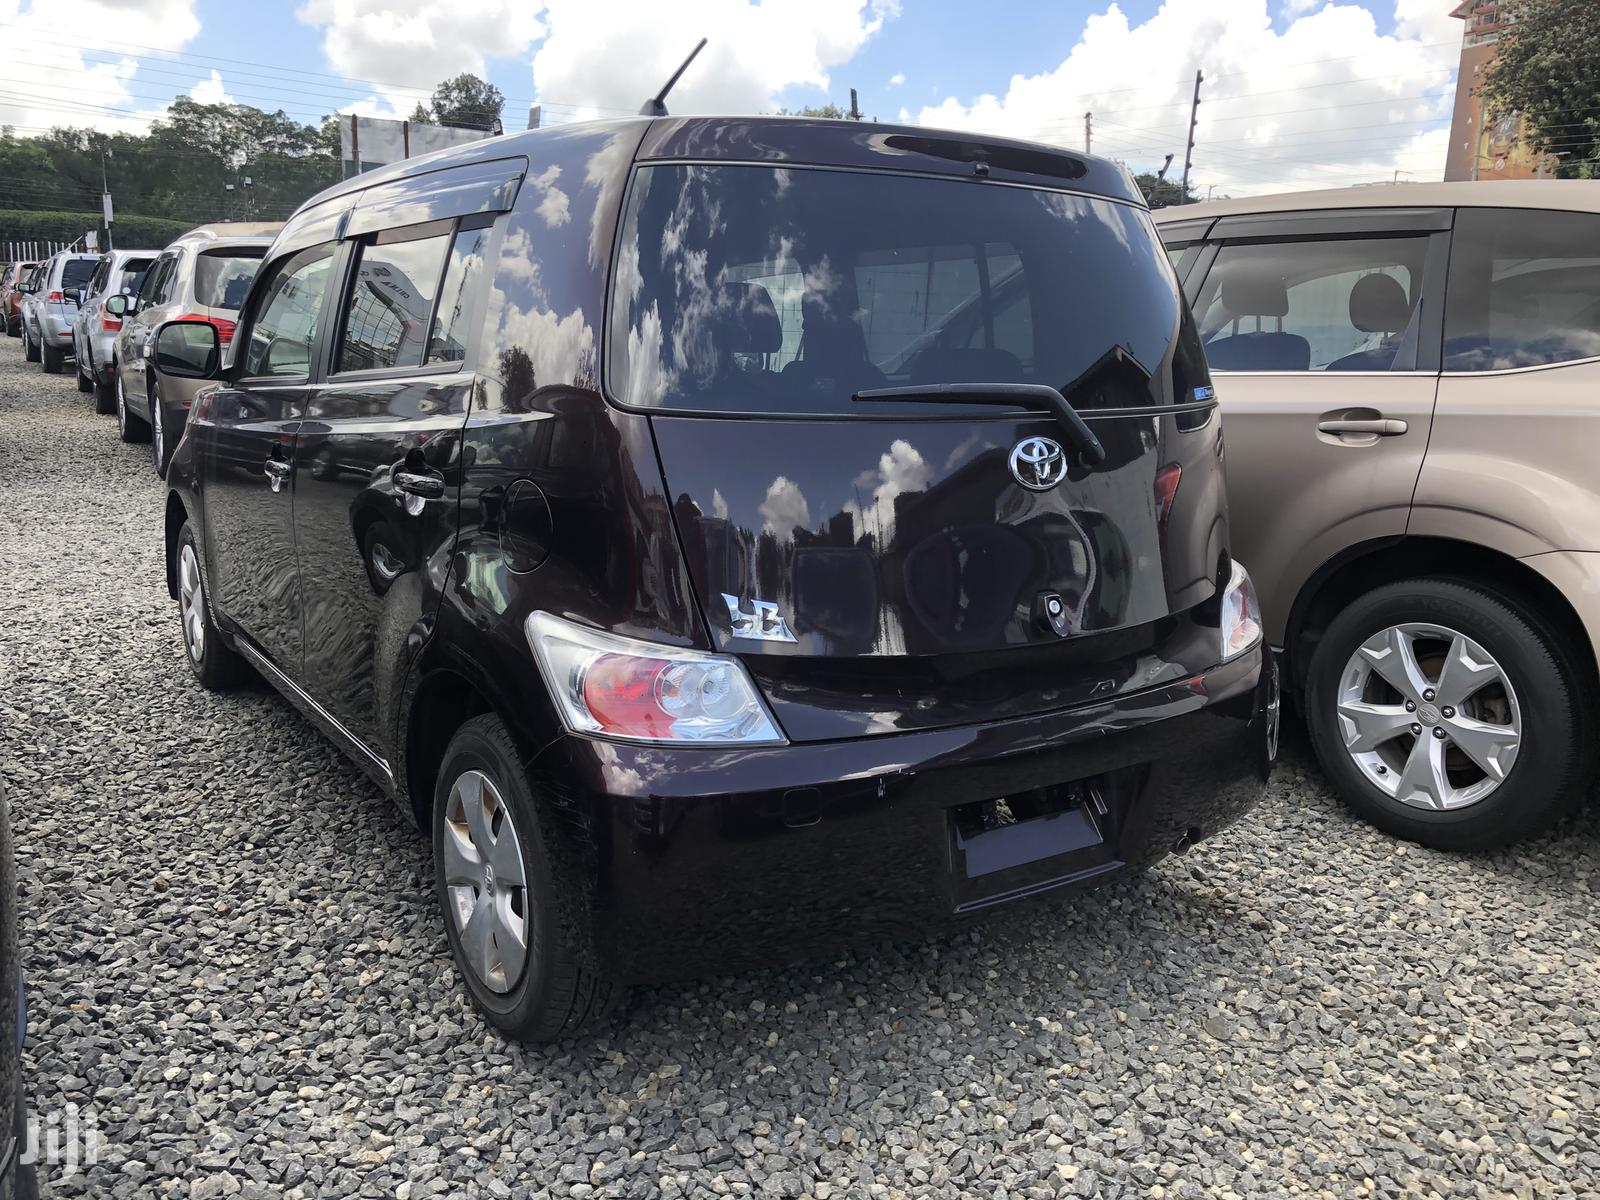 Toyota bB 2012 Black | Cars for sale in Kilimani, Nairobi, Kenya